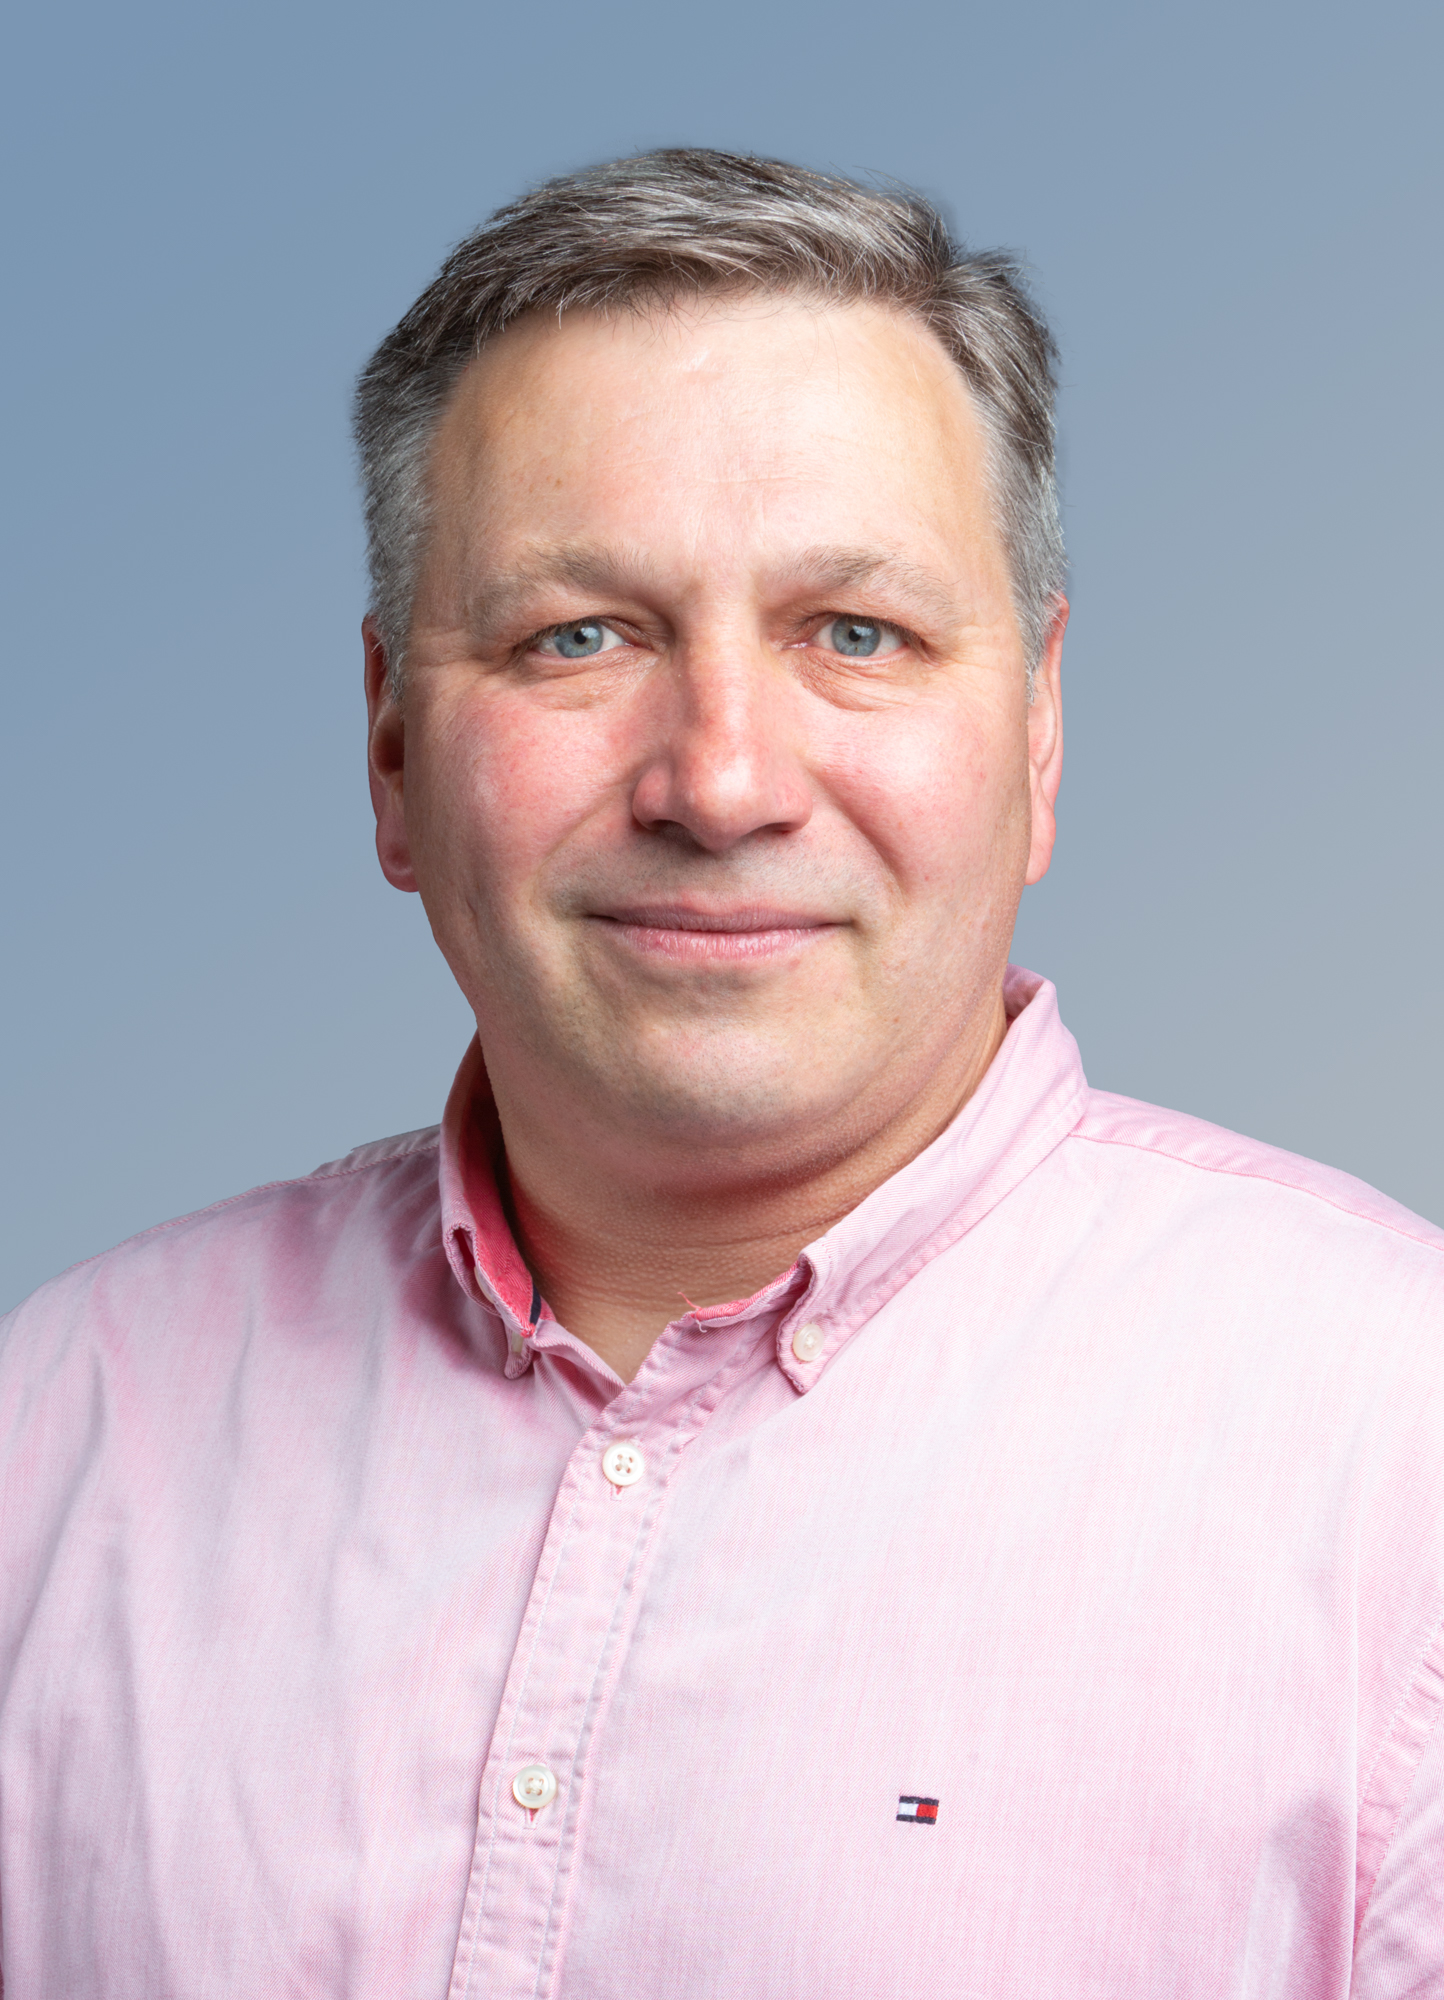 Heinz-Konrad Leipertz für Floßdorf / Tetz